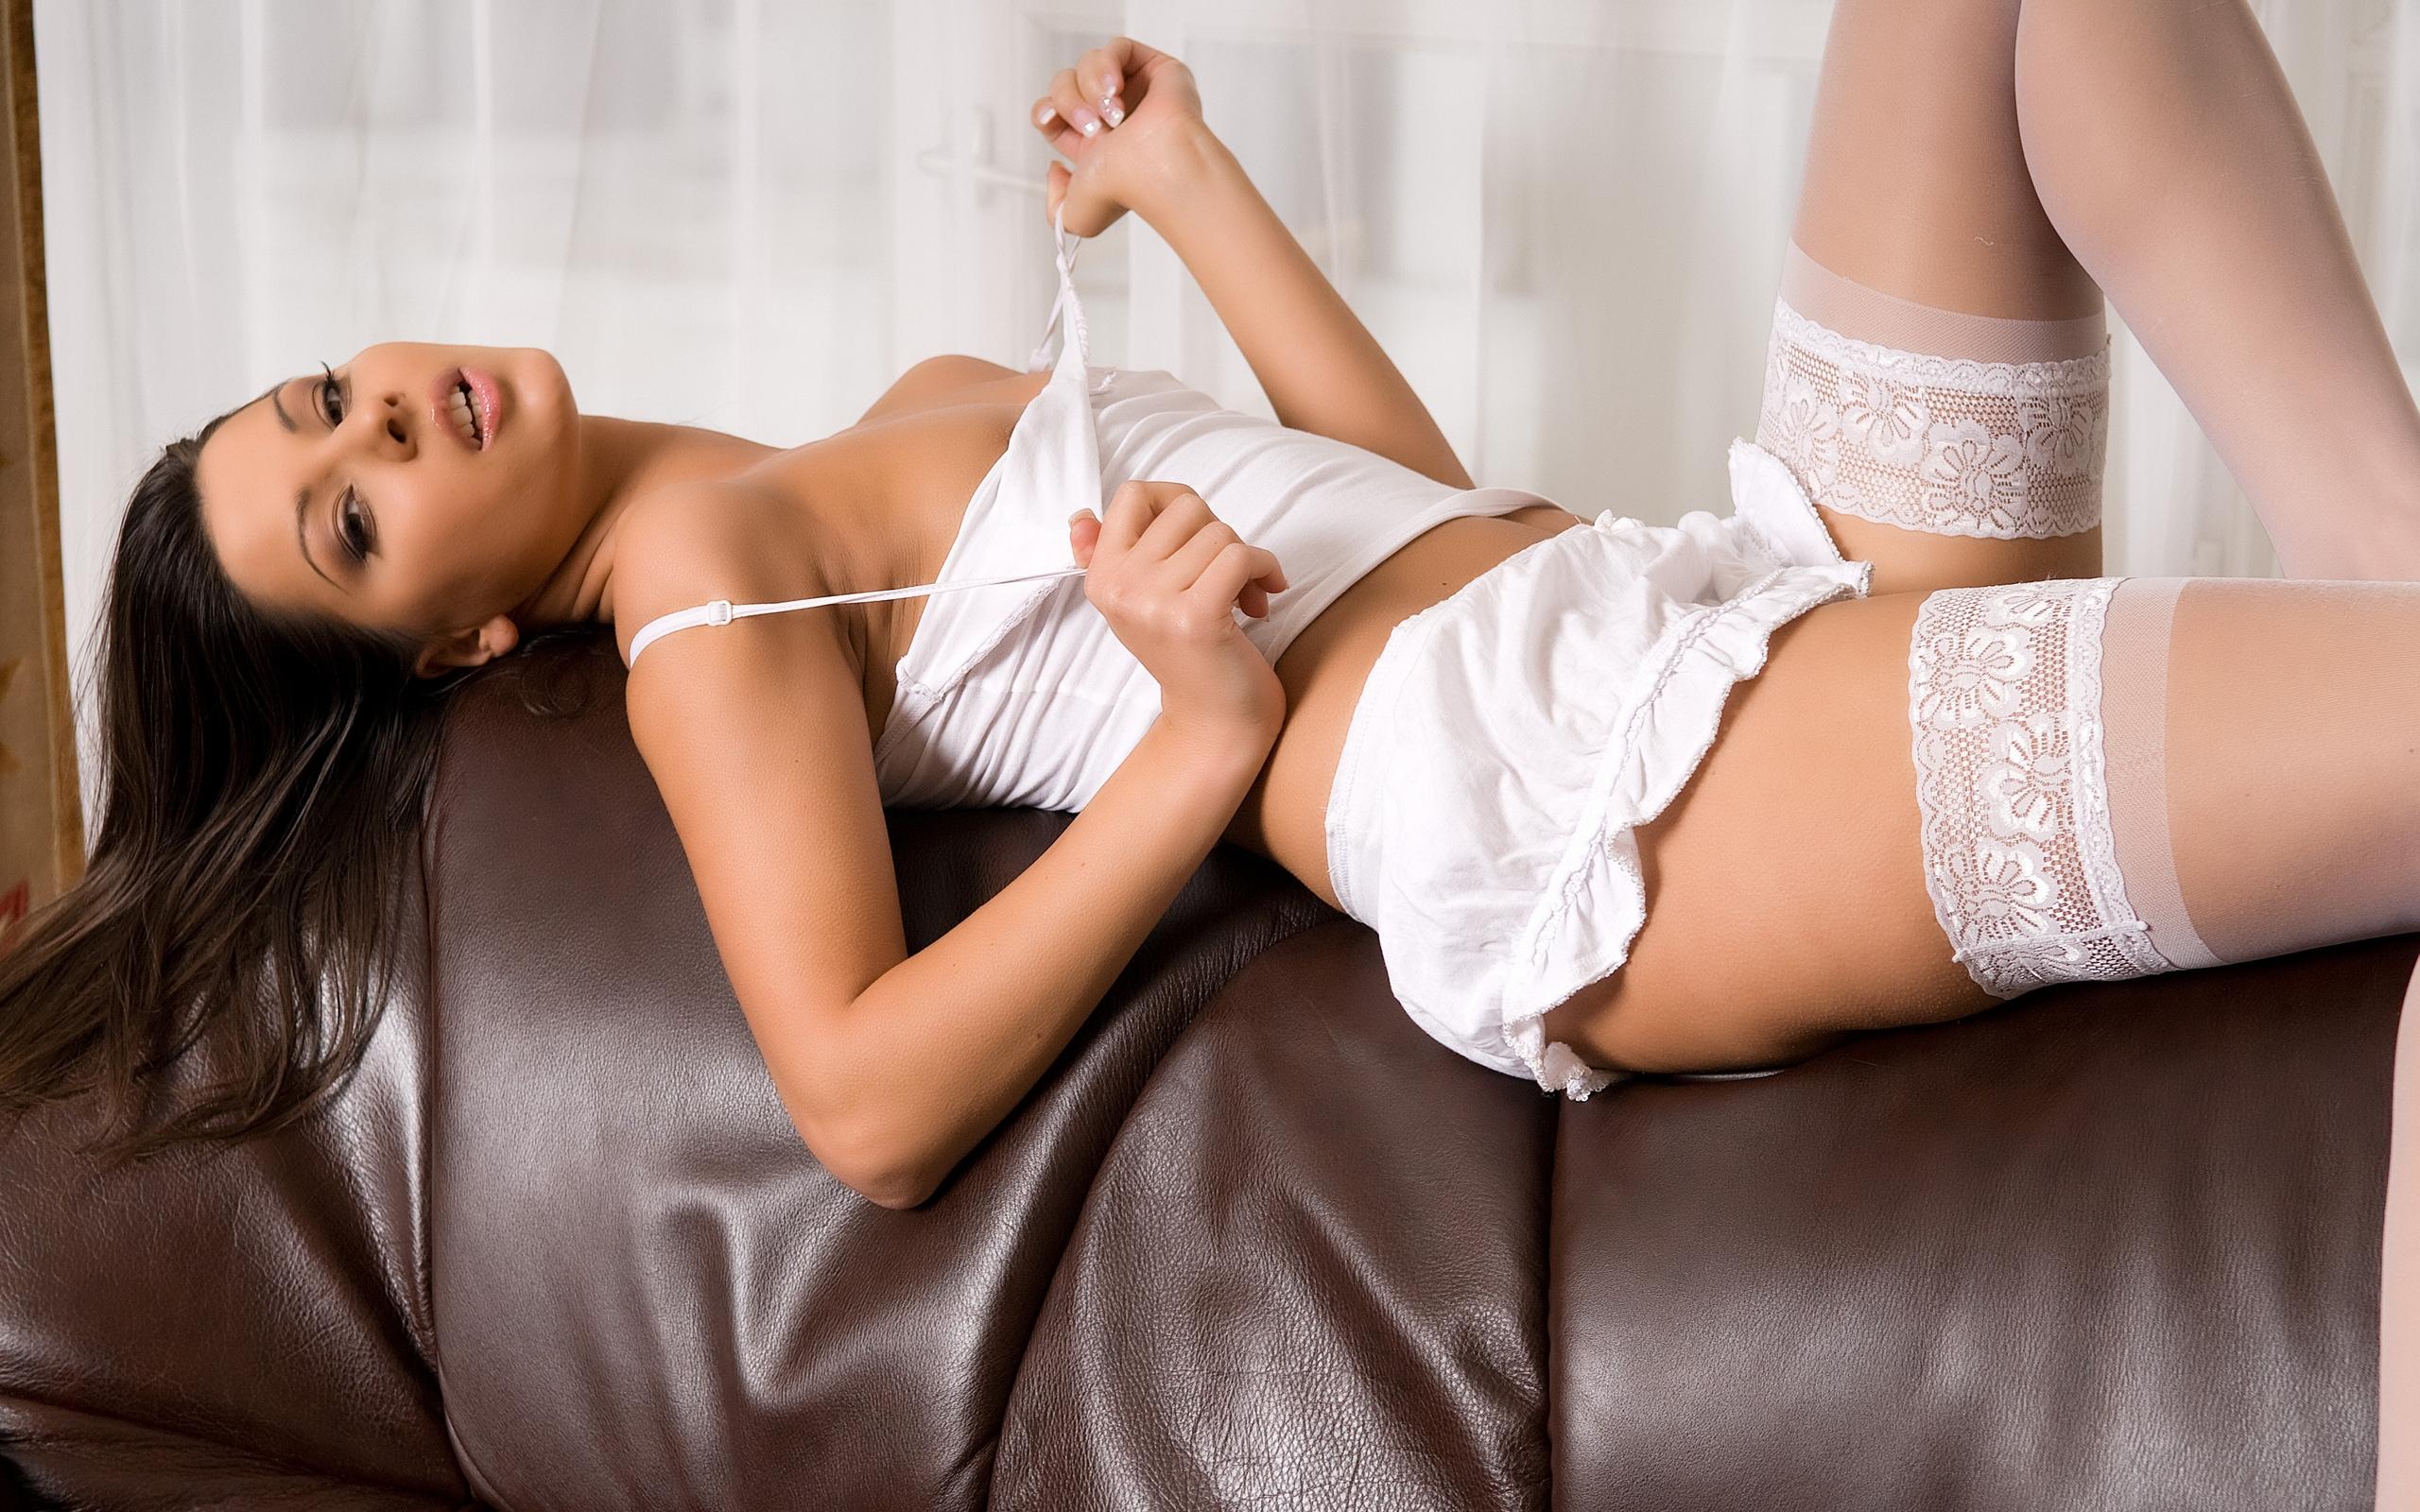 диван, брюнетка, топик